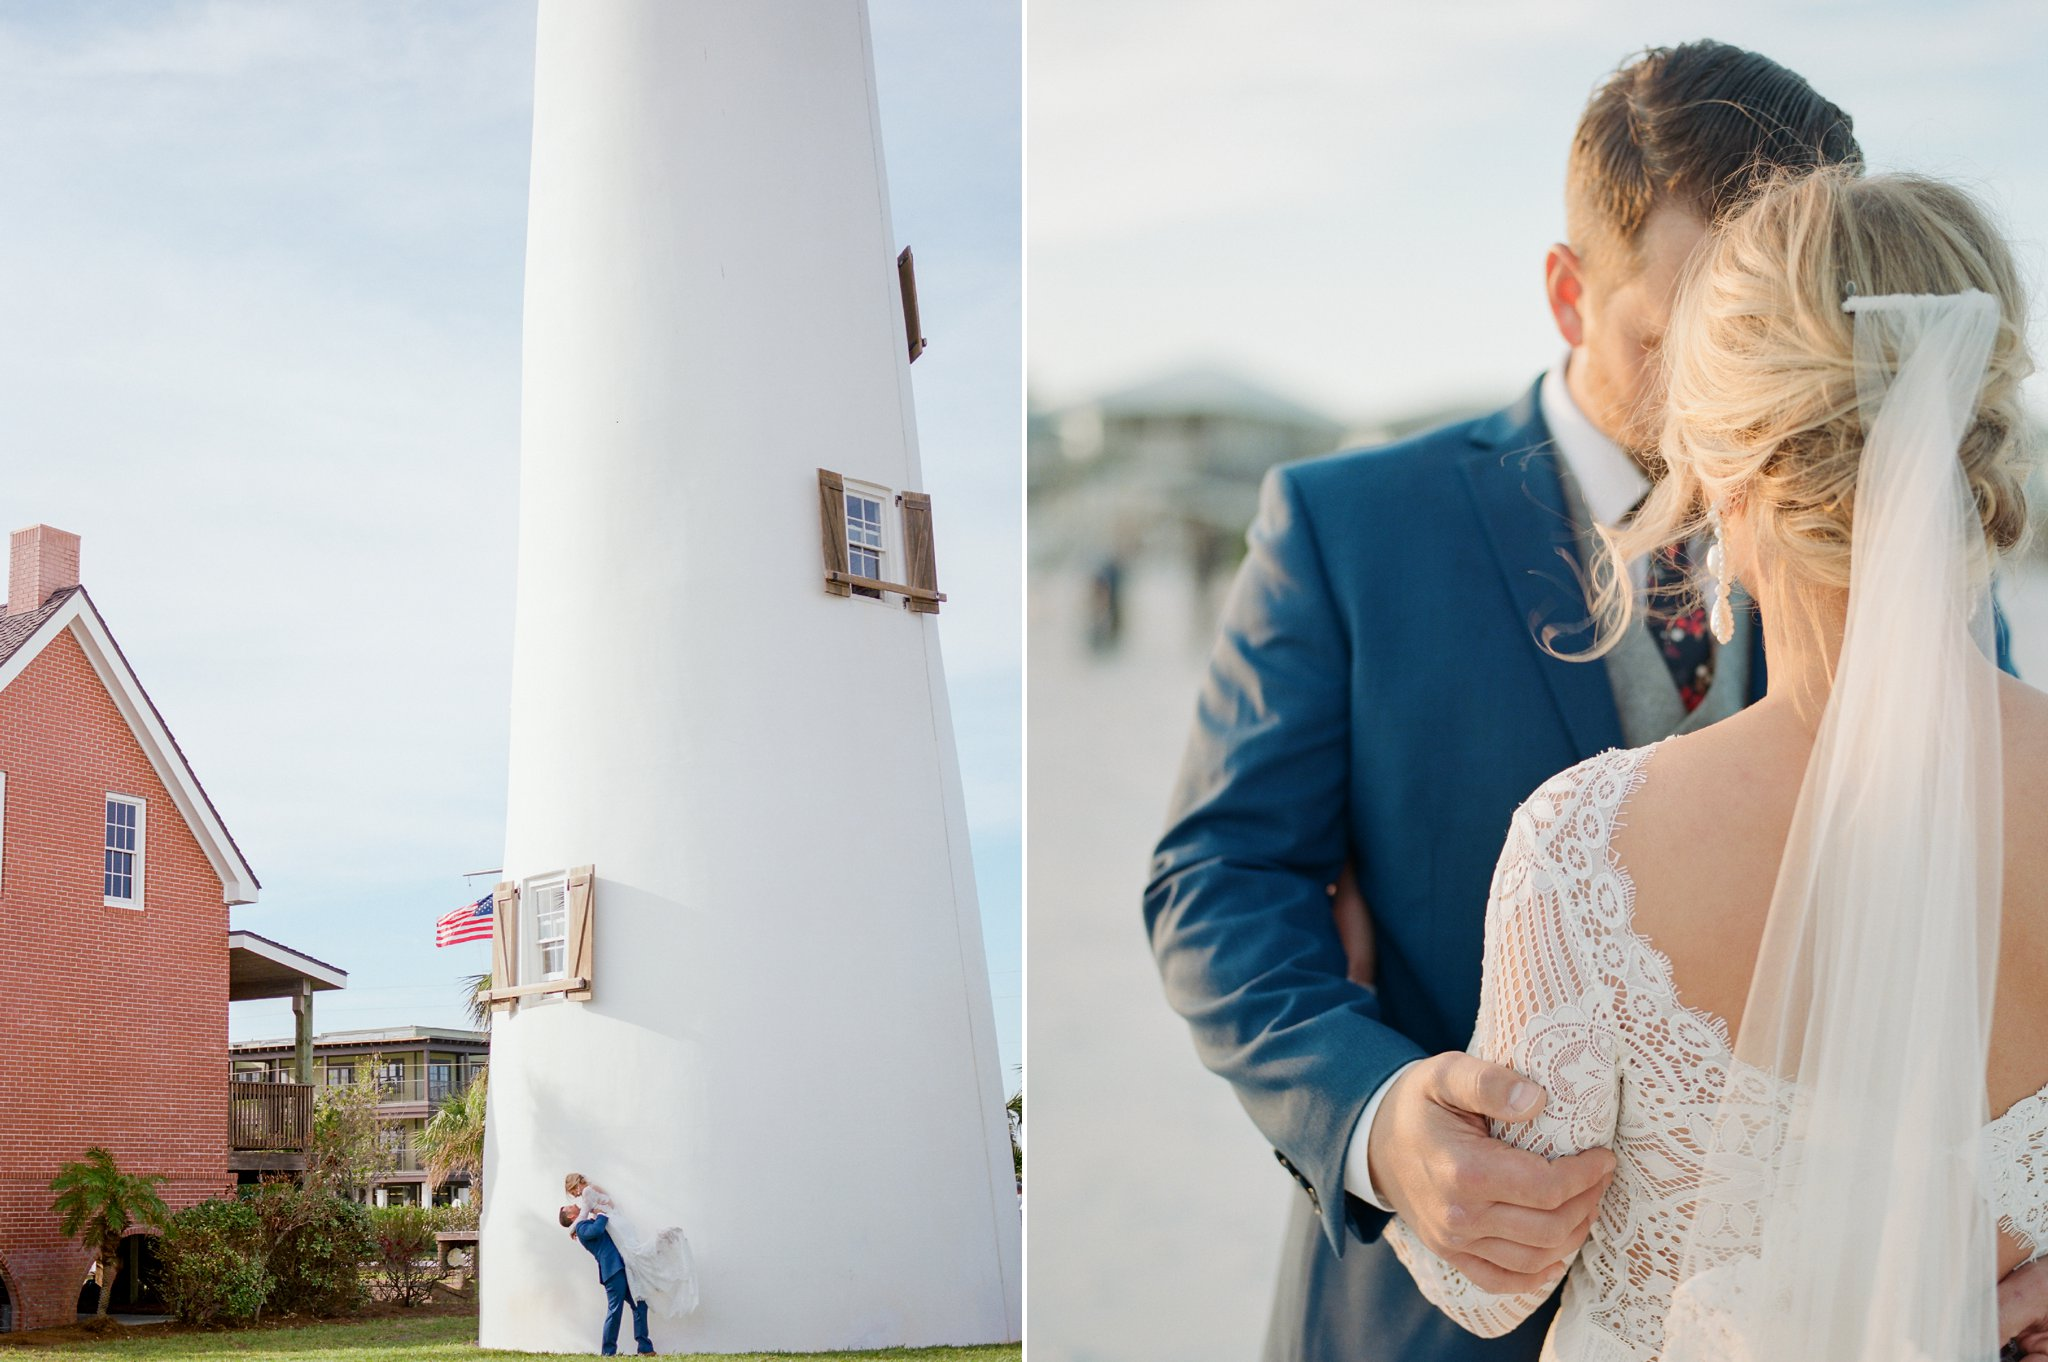 st+george+island+wedding+st+george+island+photographer+shannon+griffin+photography_0048.jpg